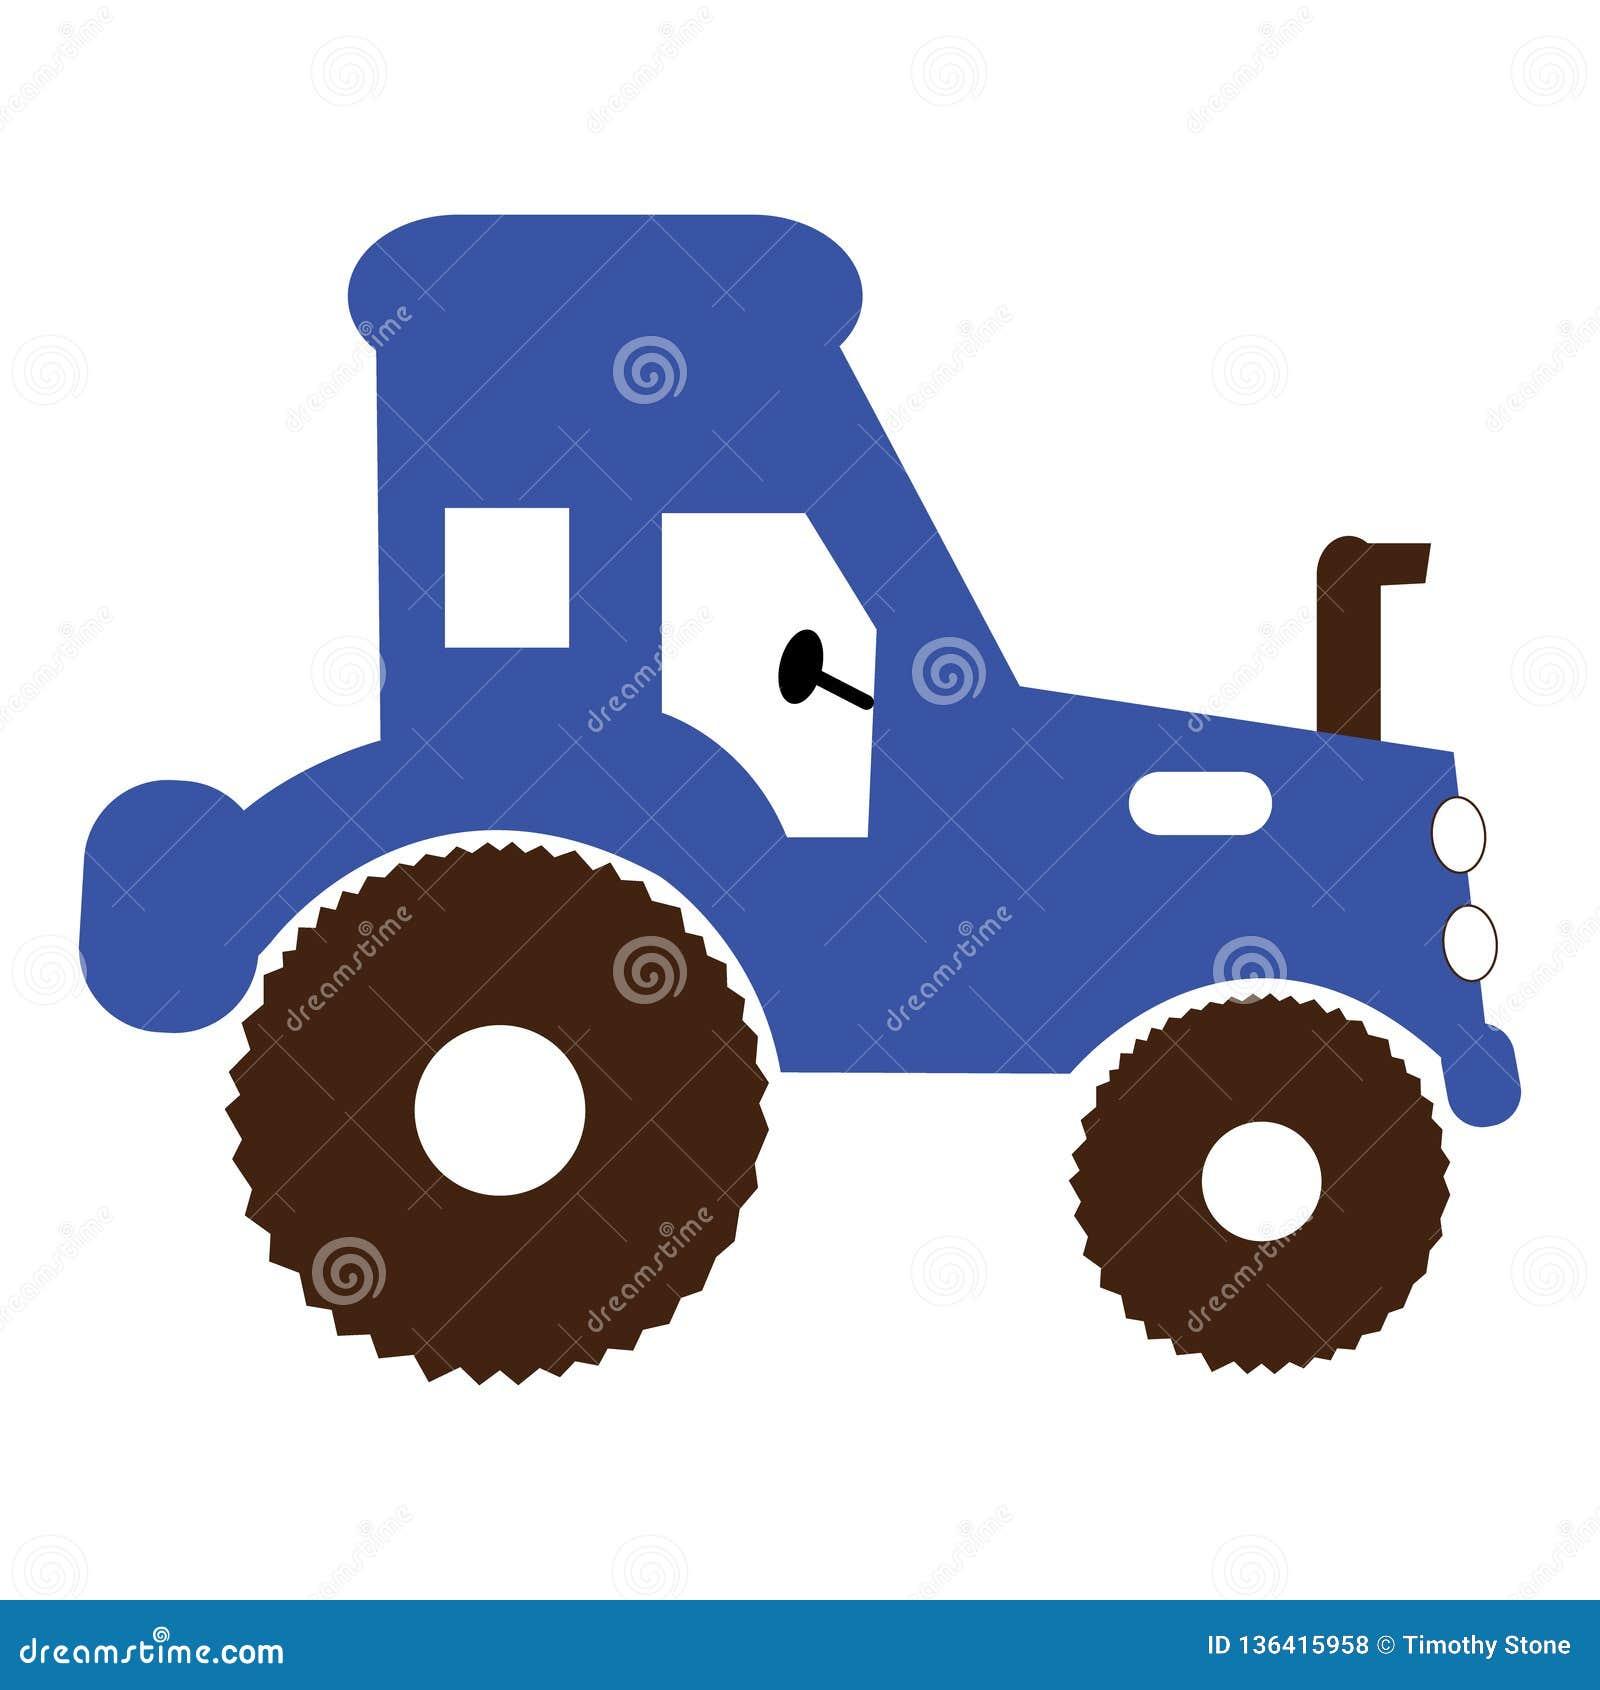 Simple tractor illustration